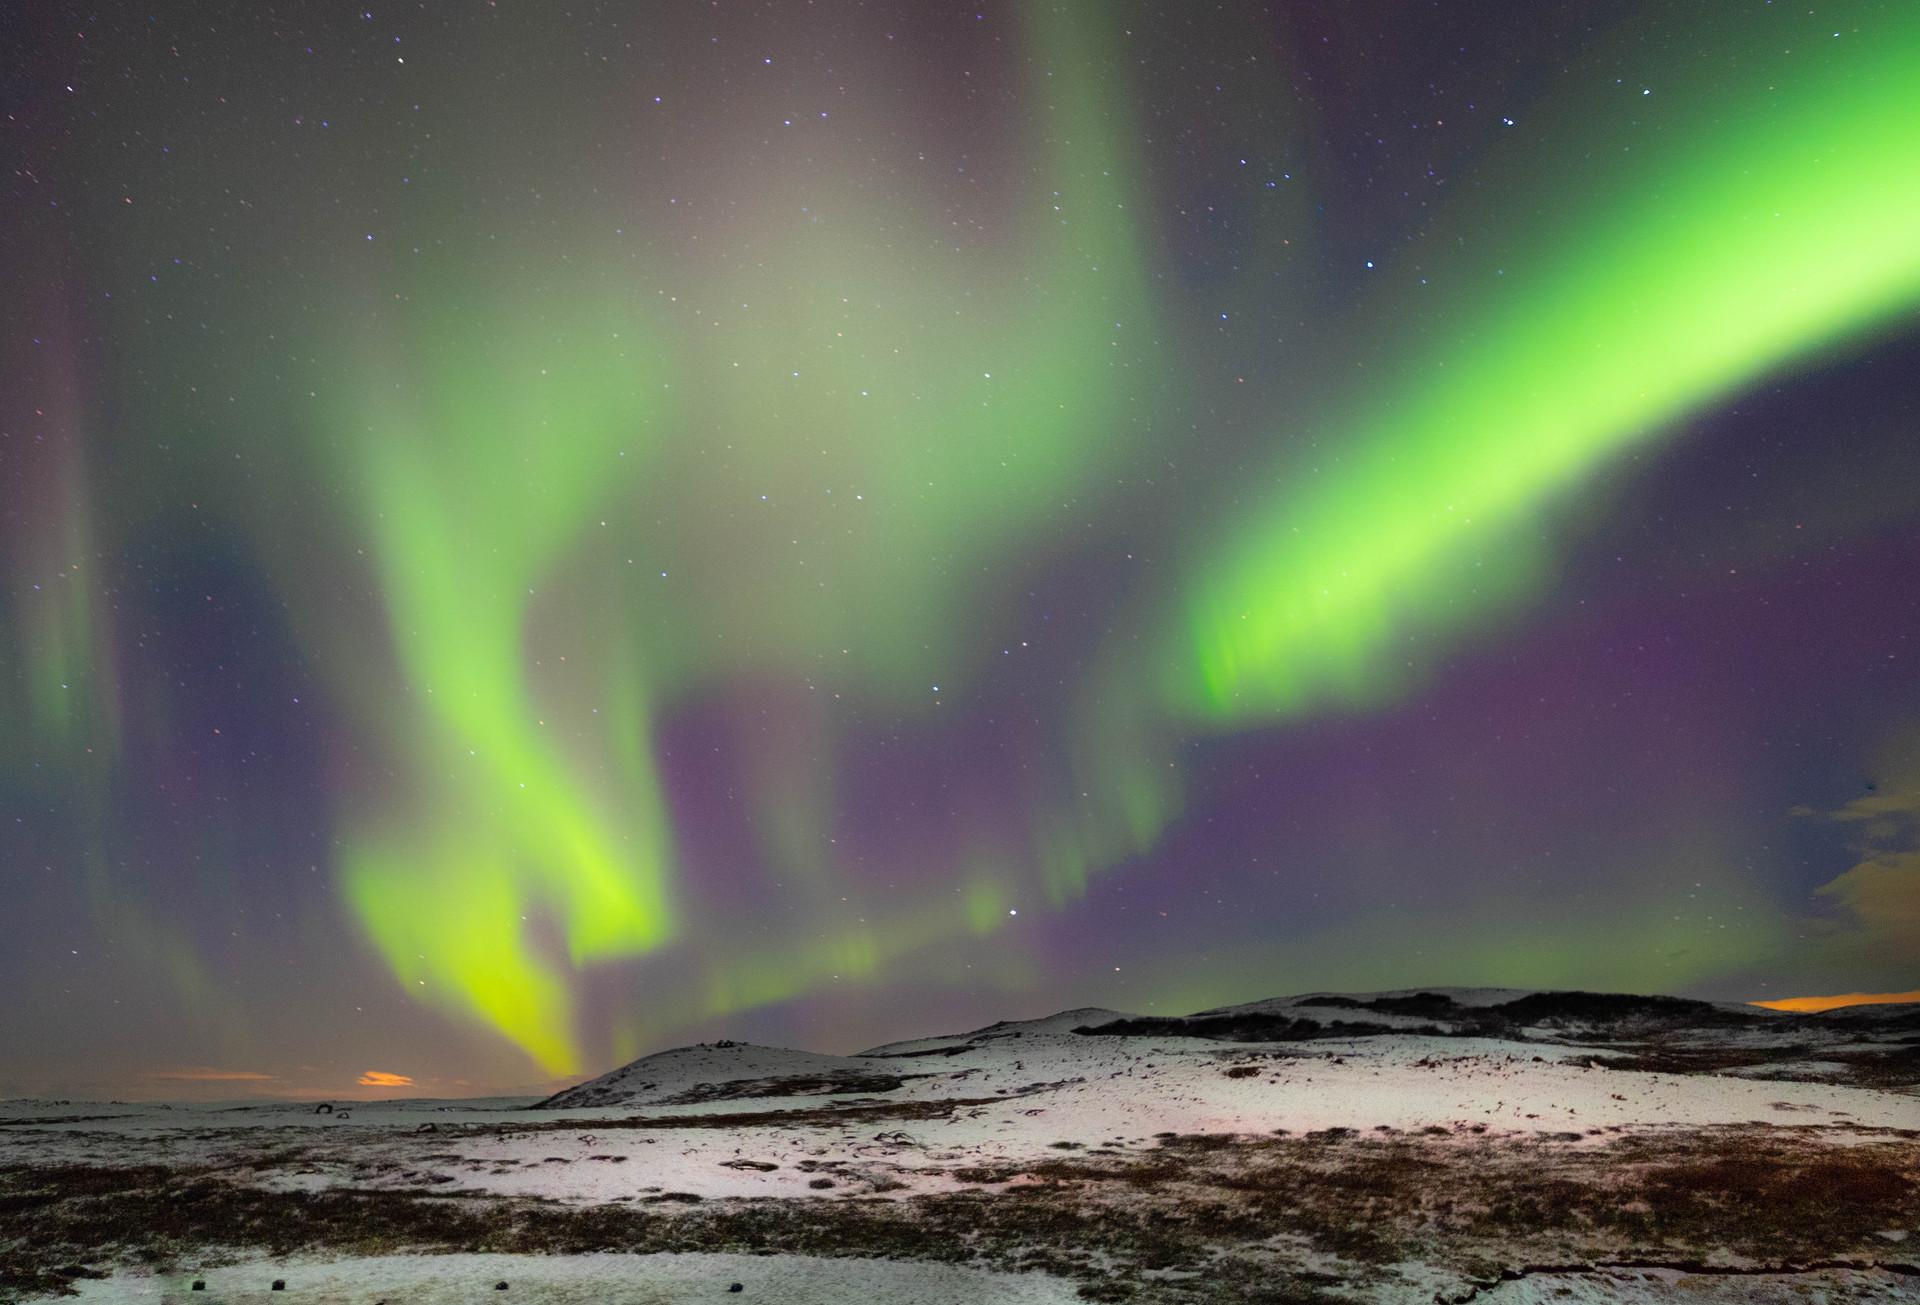 Aurora Borealis-Nothern lights, Iceland